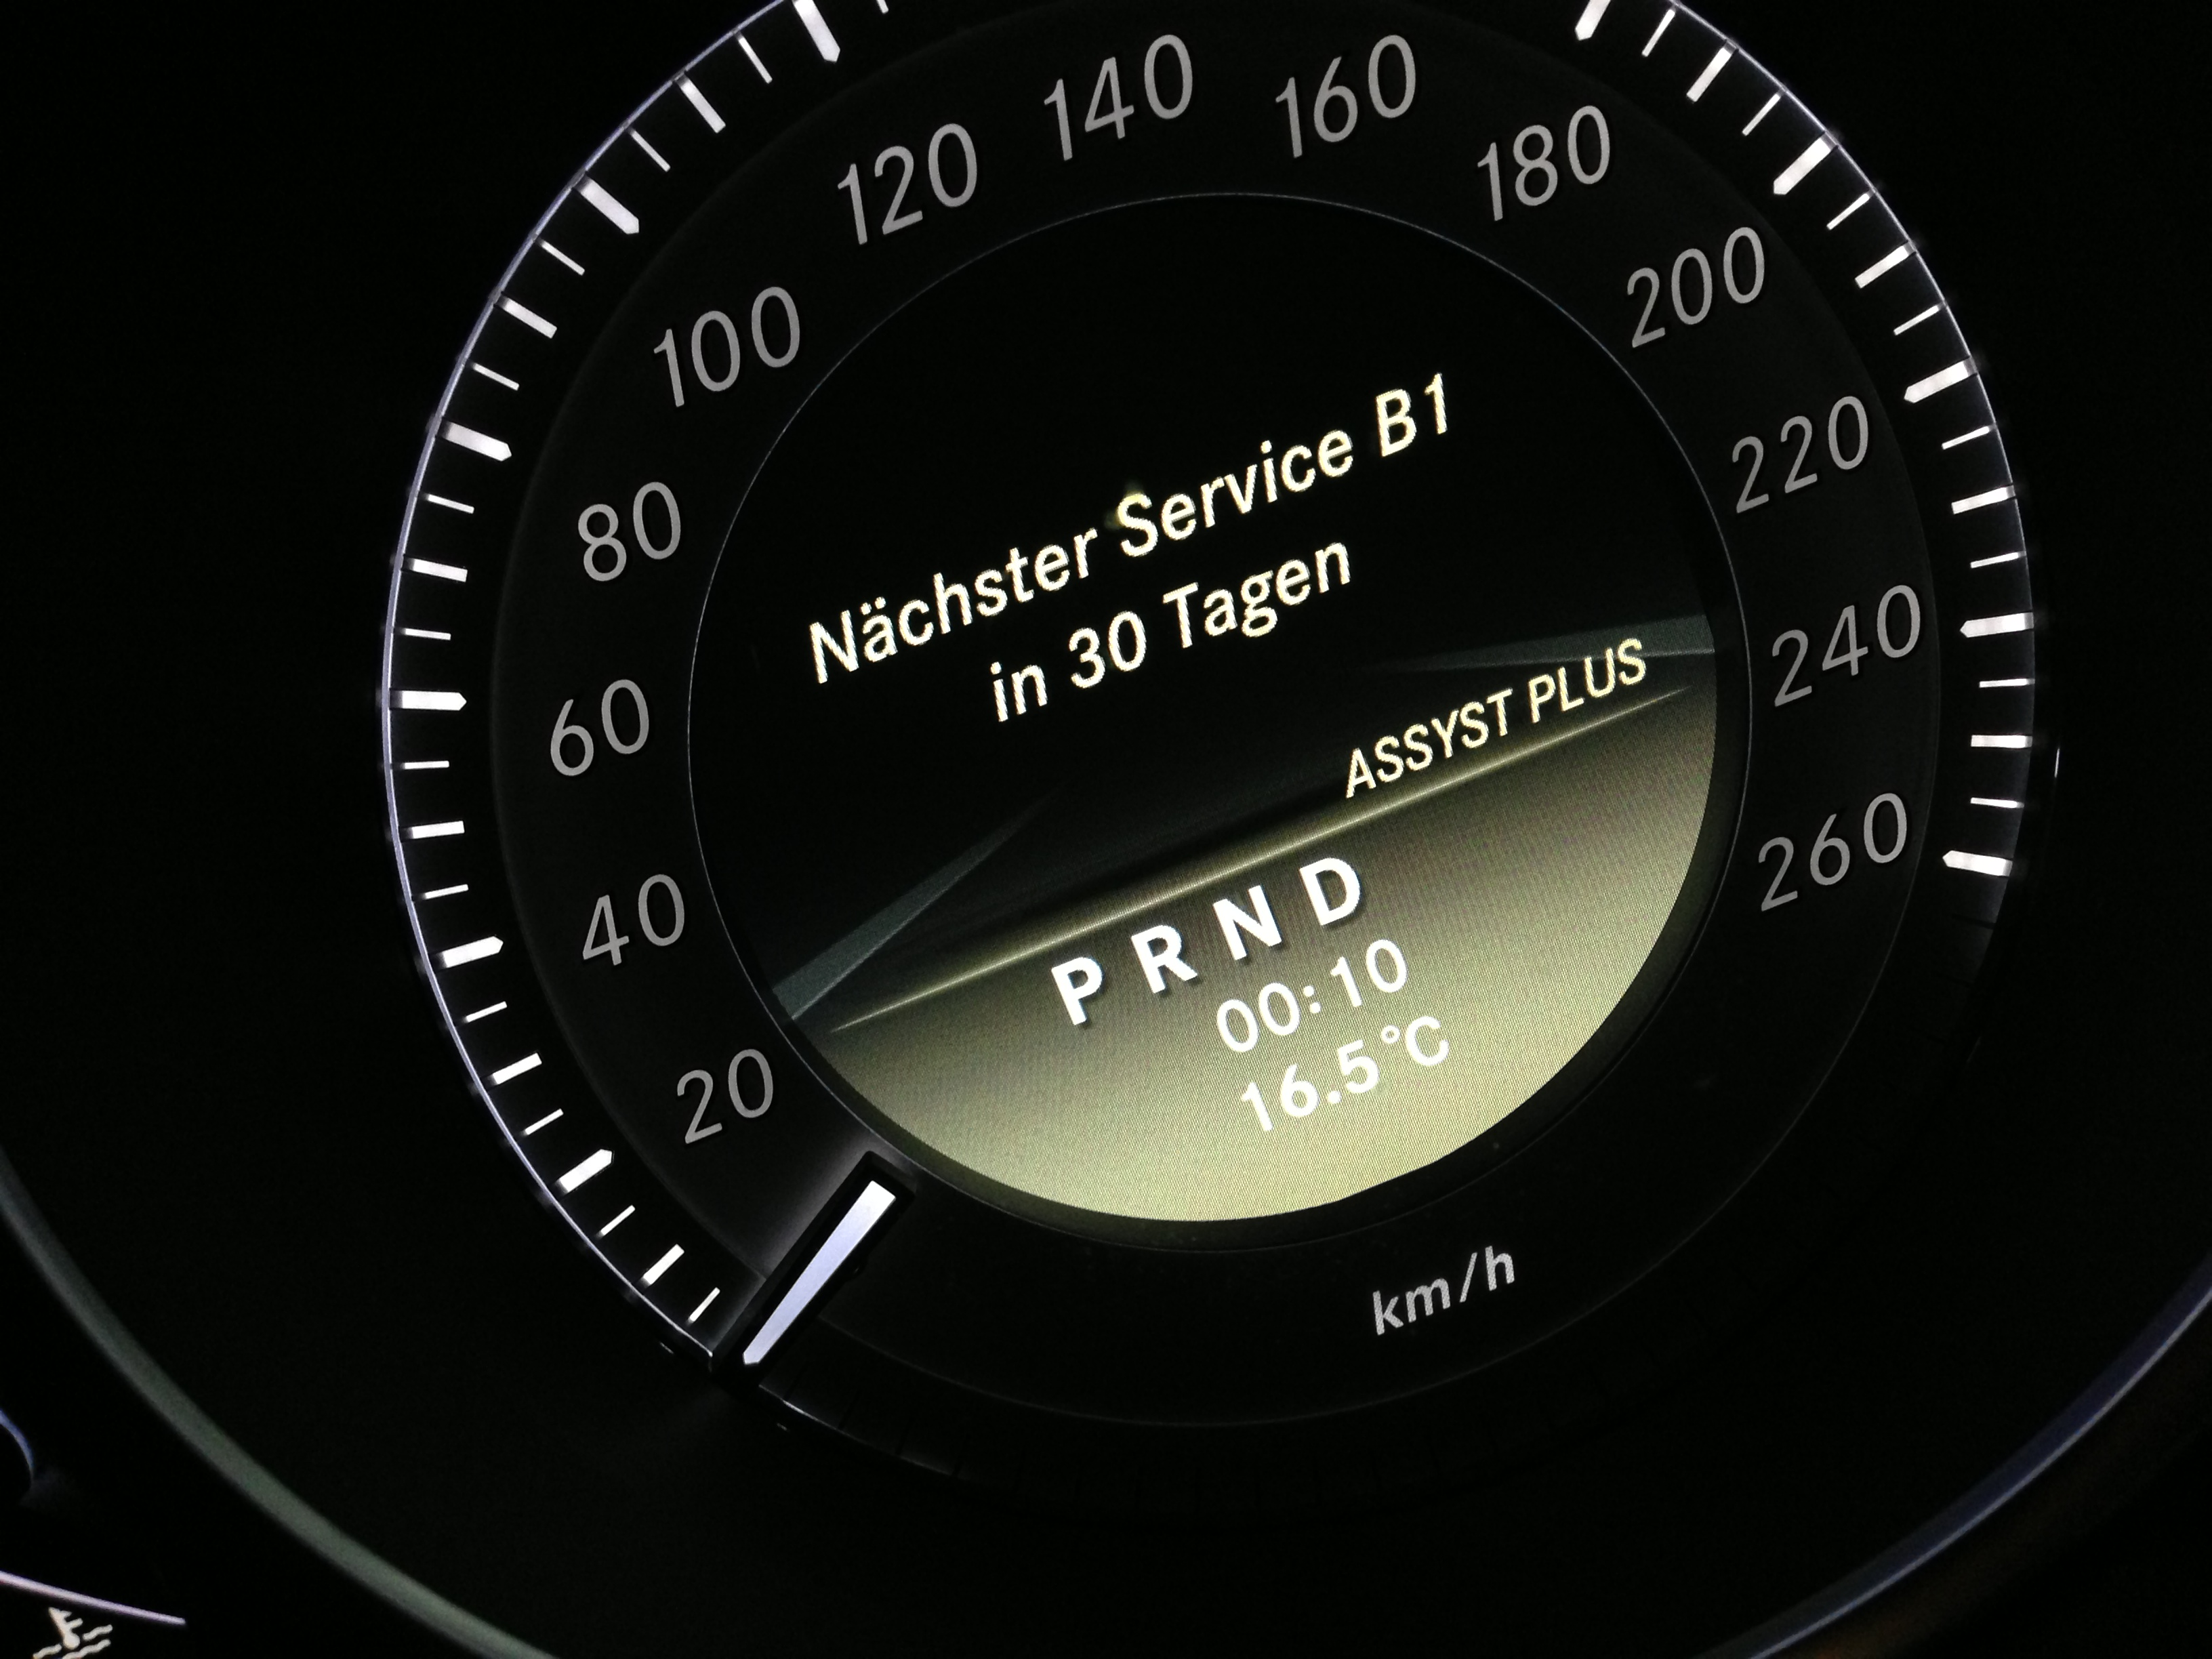 mercedes benz service b1 mercedes benz